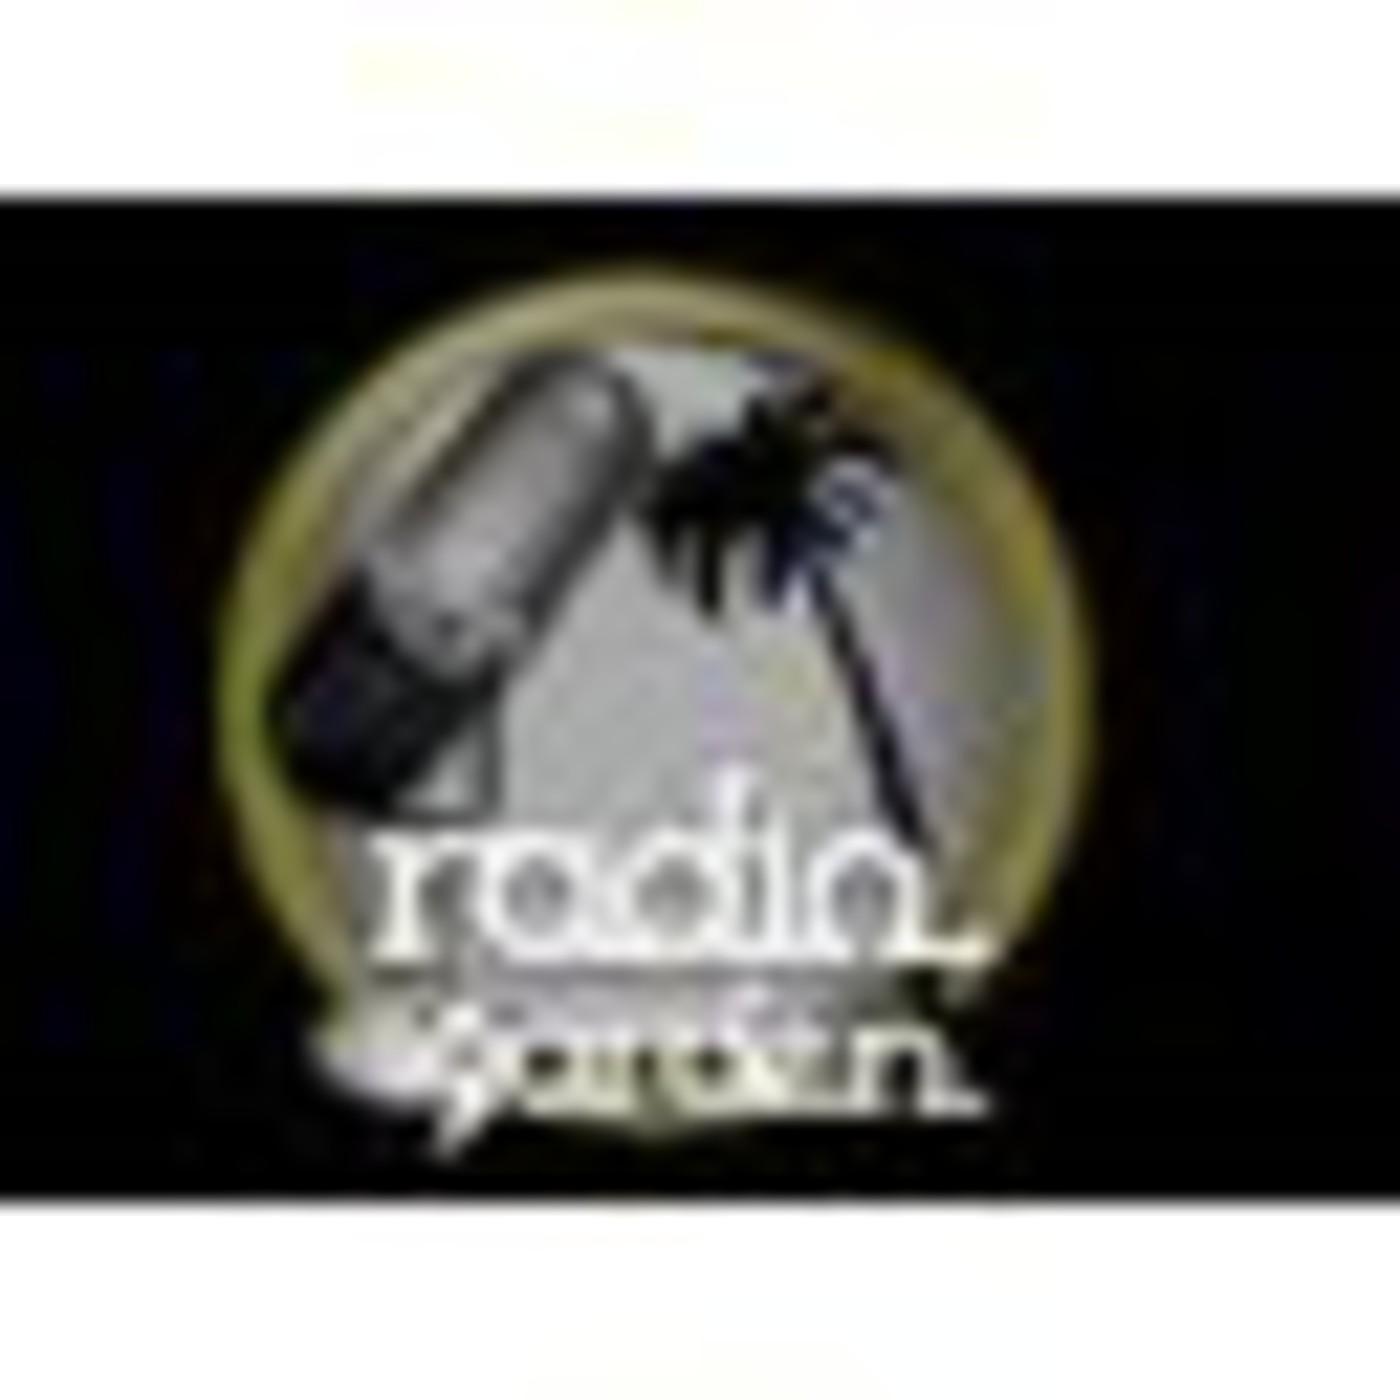 radio garden musica